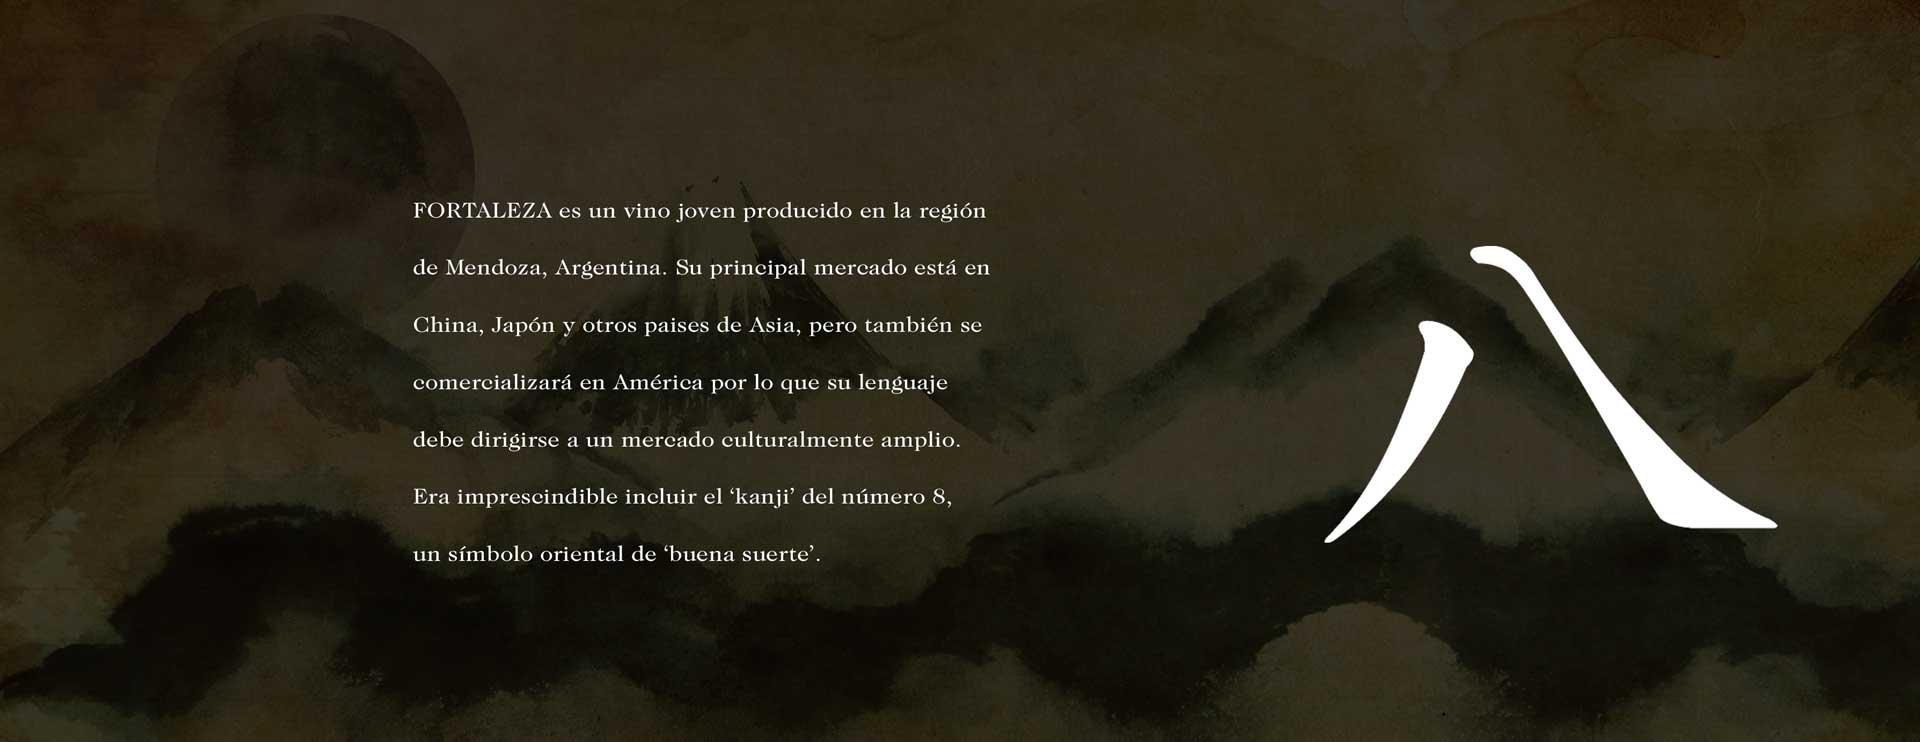 fortaleza_process03.jpg